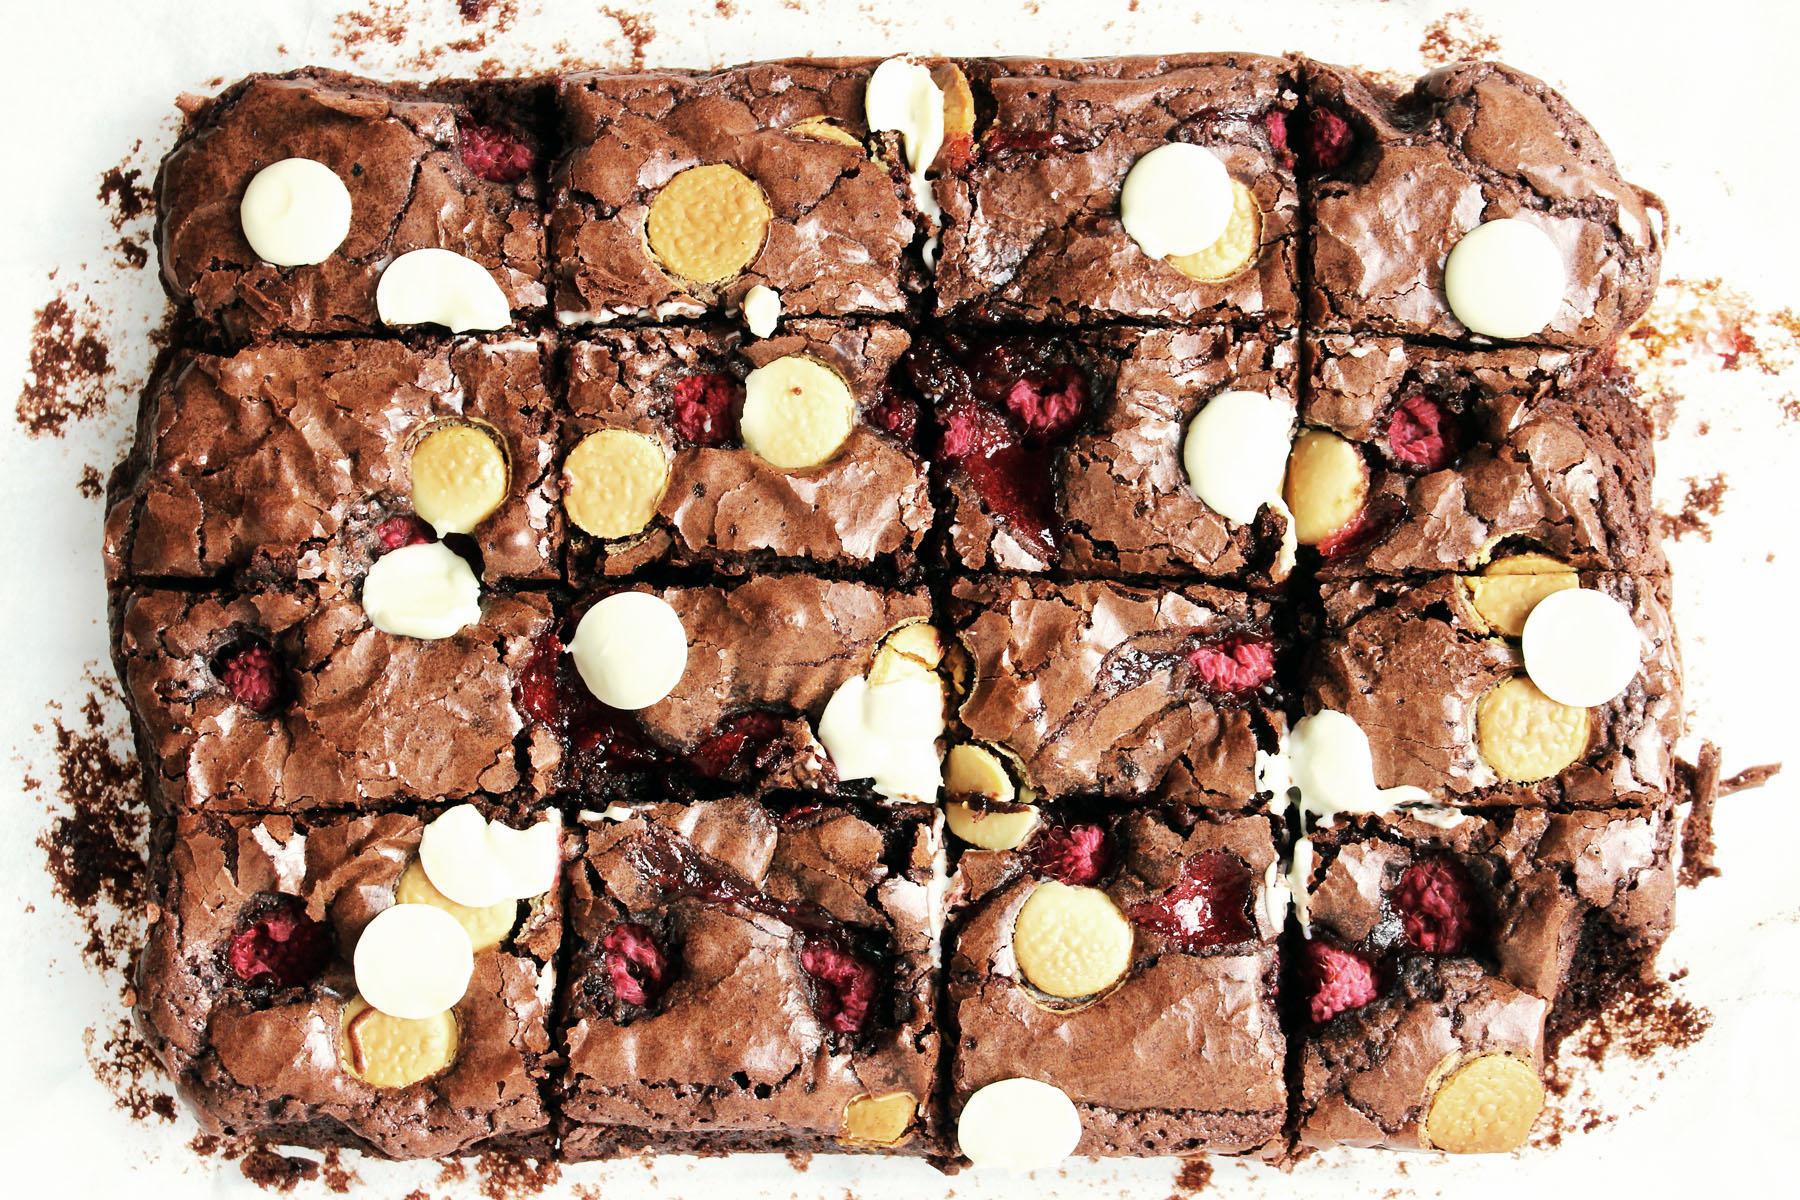 Raspberry and White Chocolate Brownies